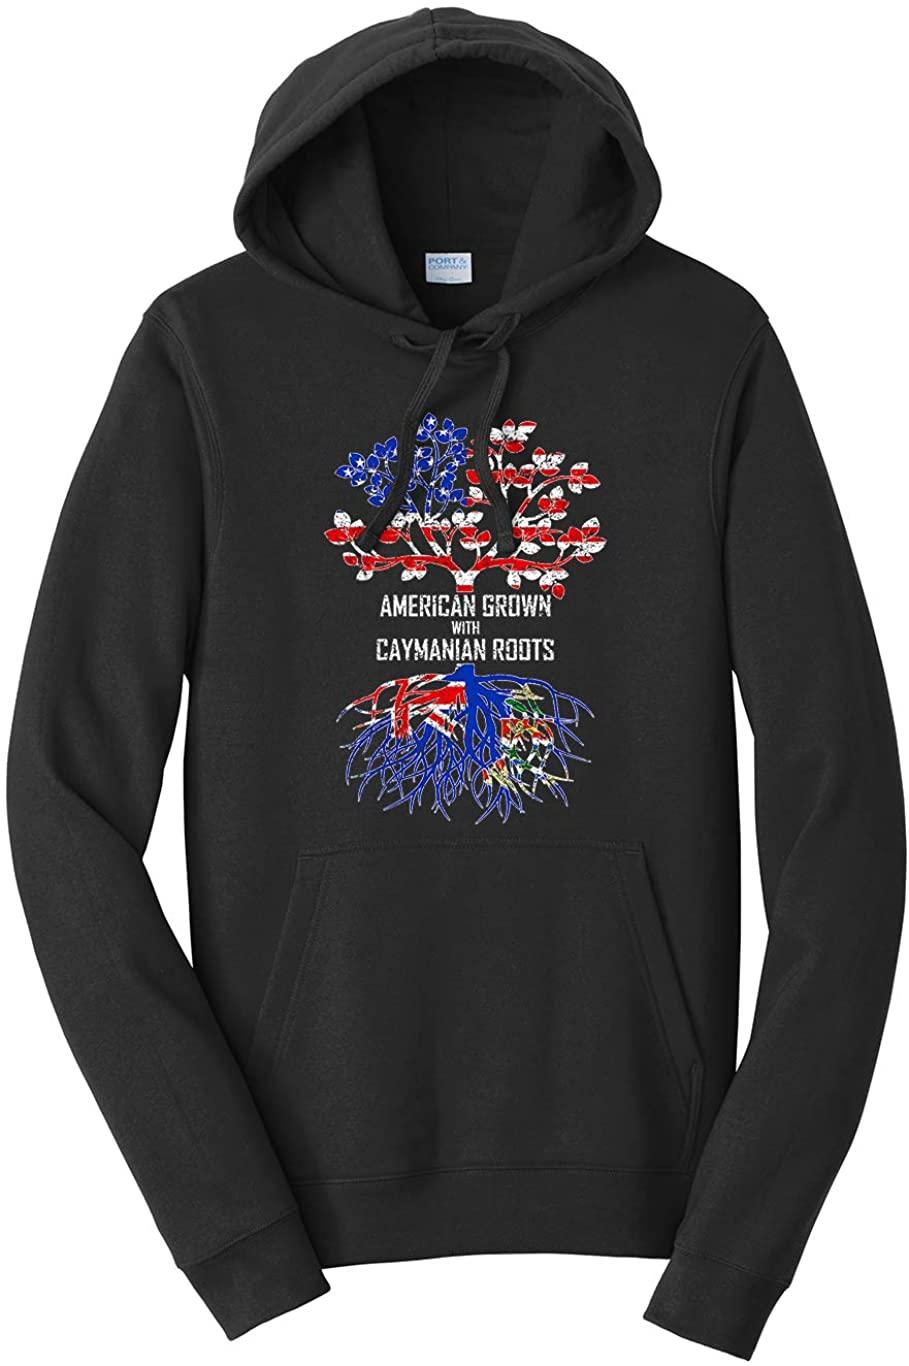 Tenacitee Unisex American Grown with Caymanian Roots Hooded Sweatshirt